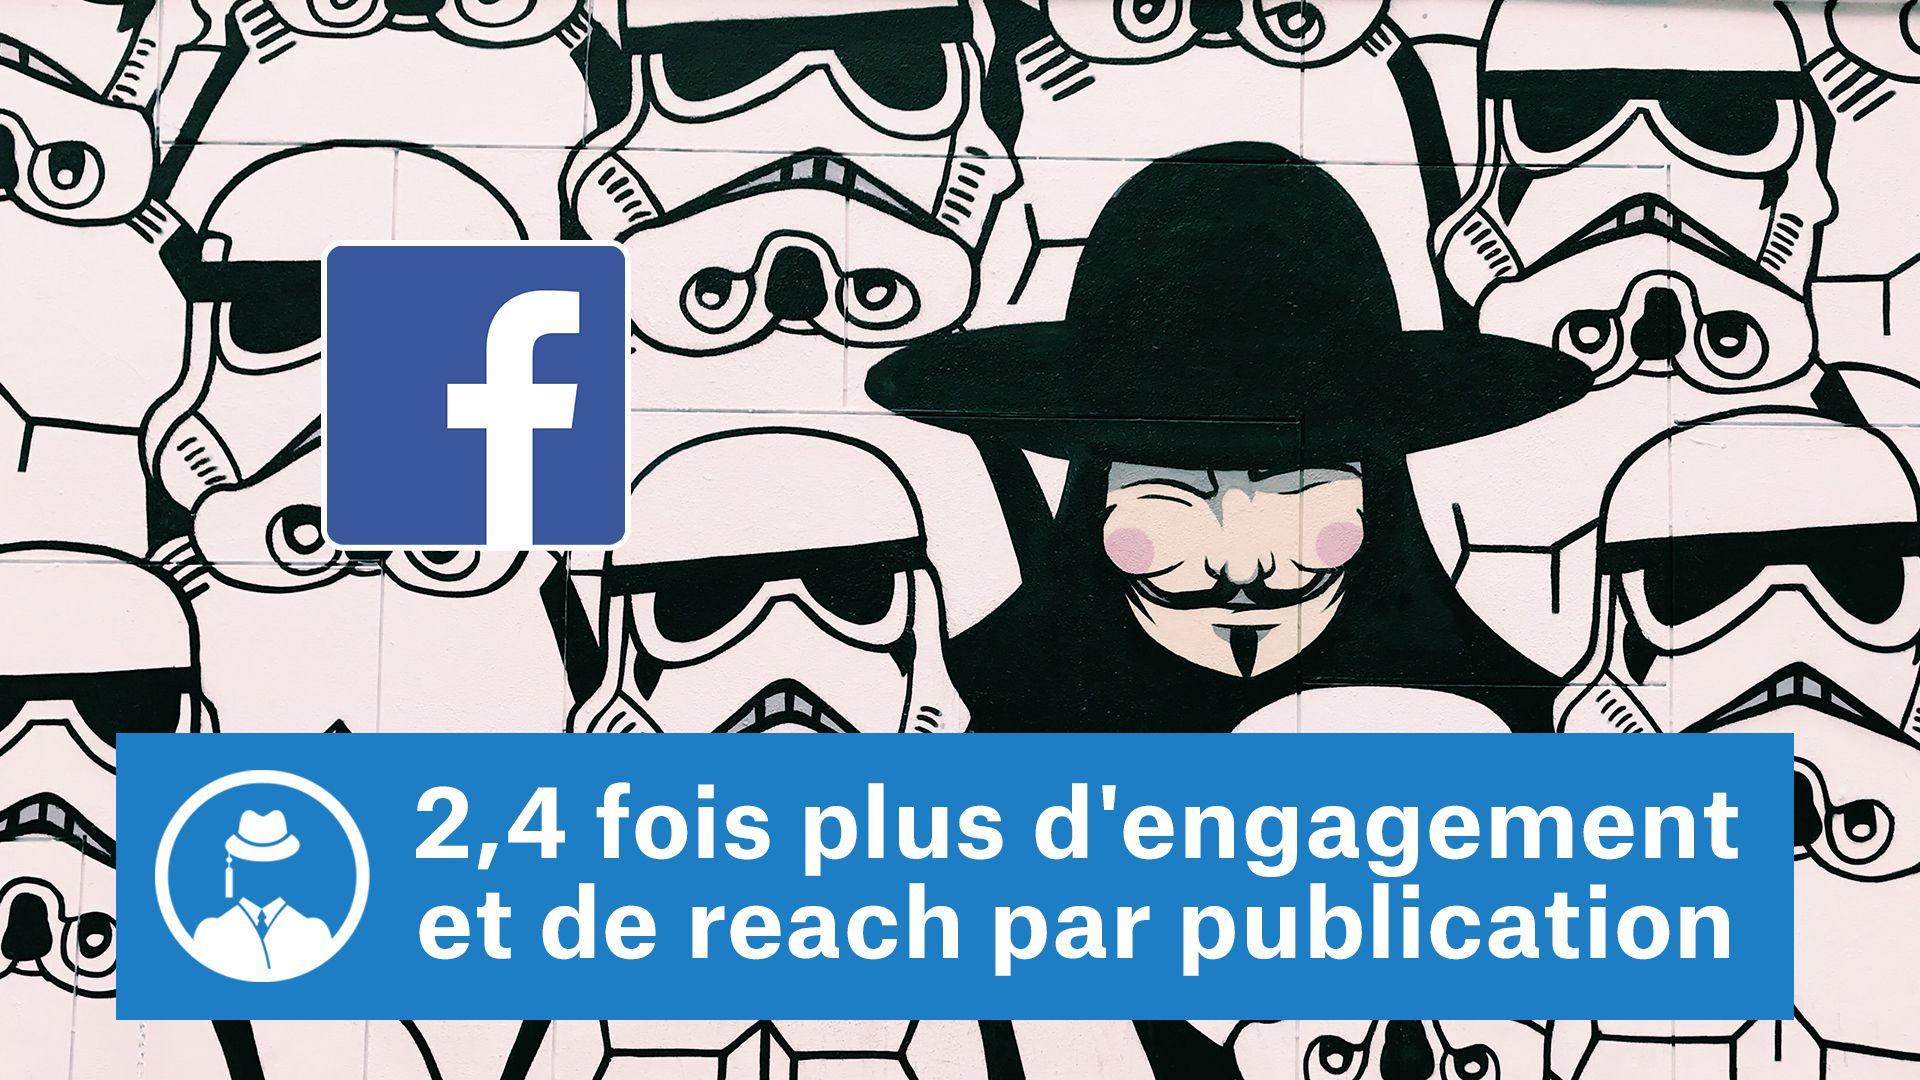 2,4 fois plus d'engagement et de reach par publication #GrowthHacking #WebMarketing #FormationGrowthHacking #CentreDeFormationFrance #TunnelAARRR #AARRR #SocialMedia #CommunityManagement #SEO #MarketingDigital #SiteWeb #Facebook